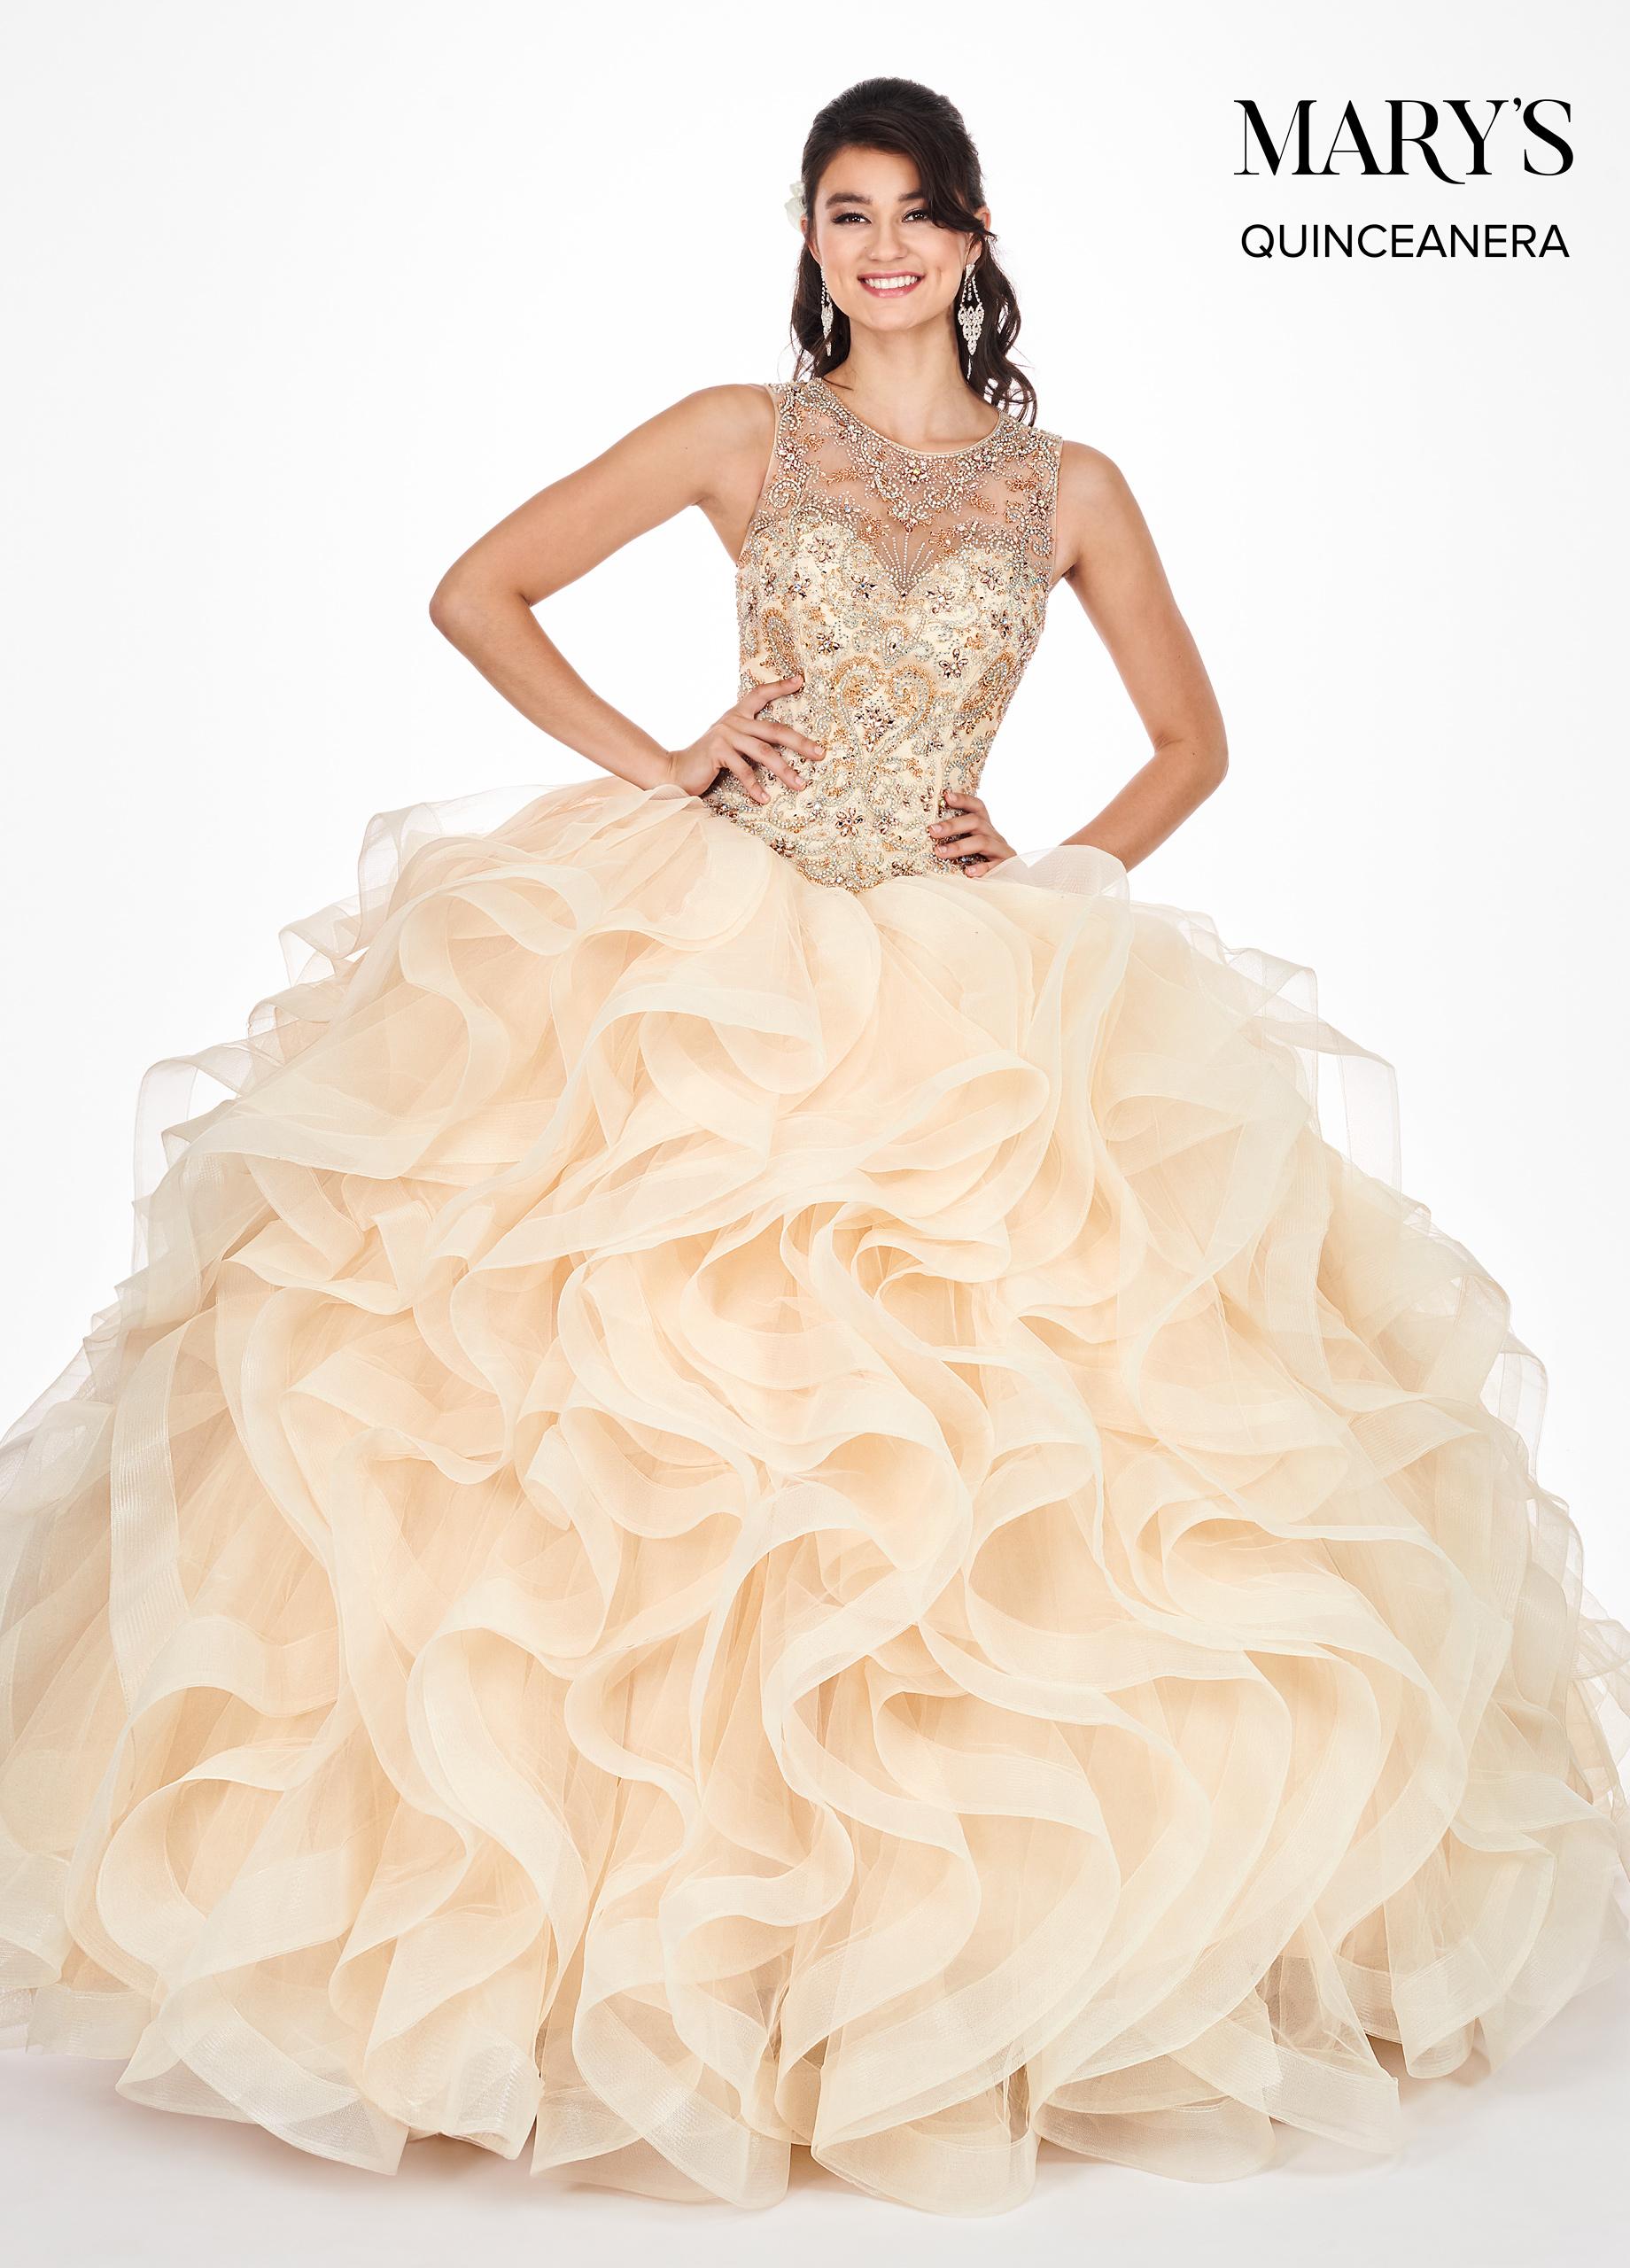 Marys Quinceanera Dresses